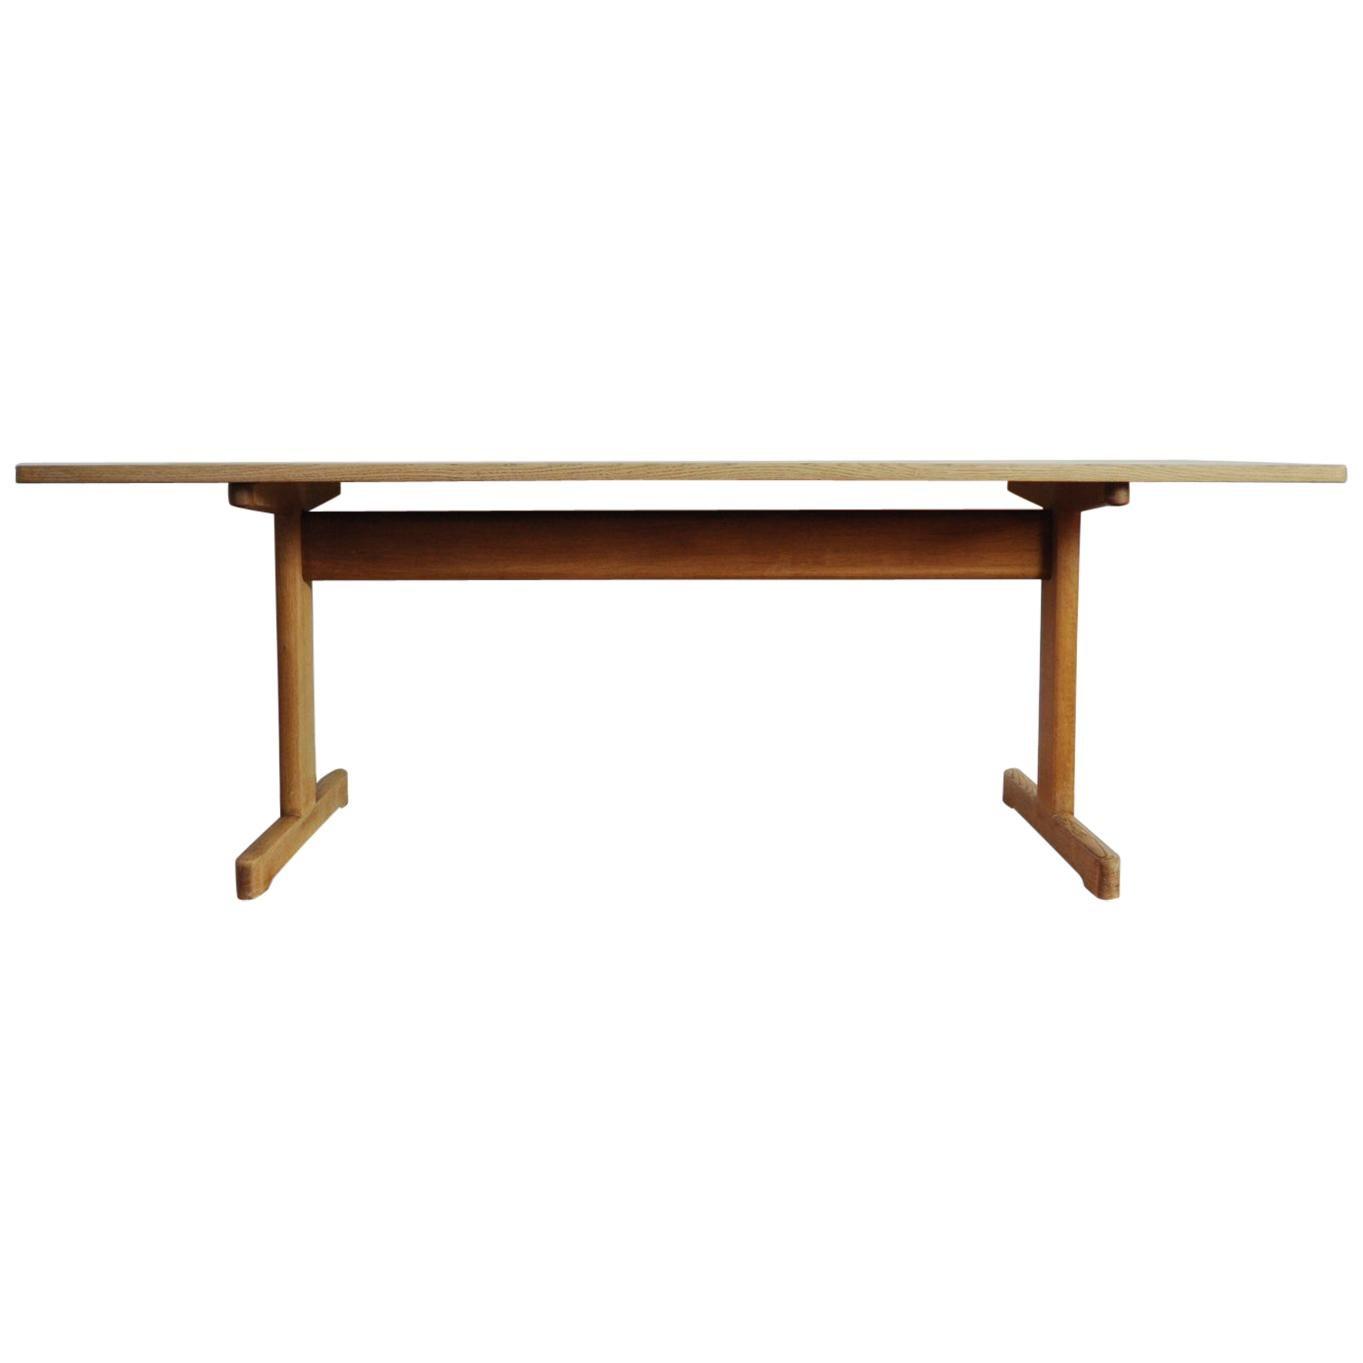 Børge Mogensen Coffee Table in Solid Oak for C.M. Madsens Fabrik, 1960s